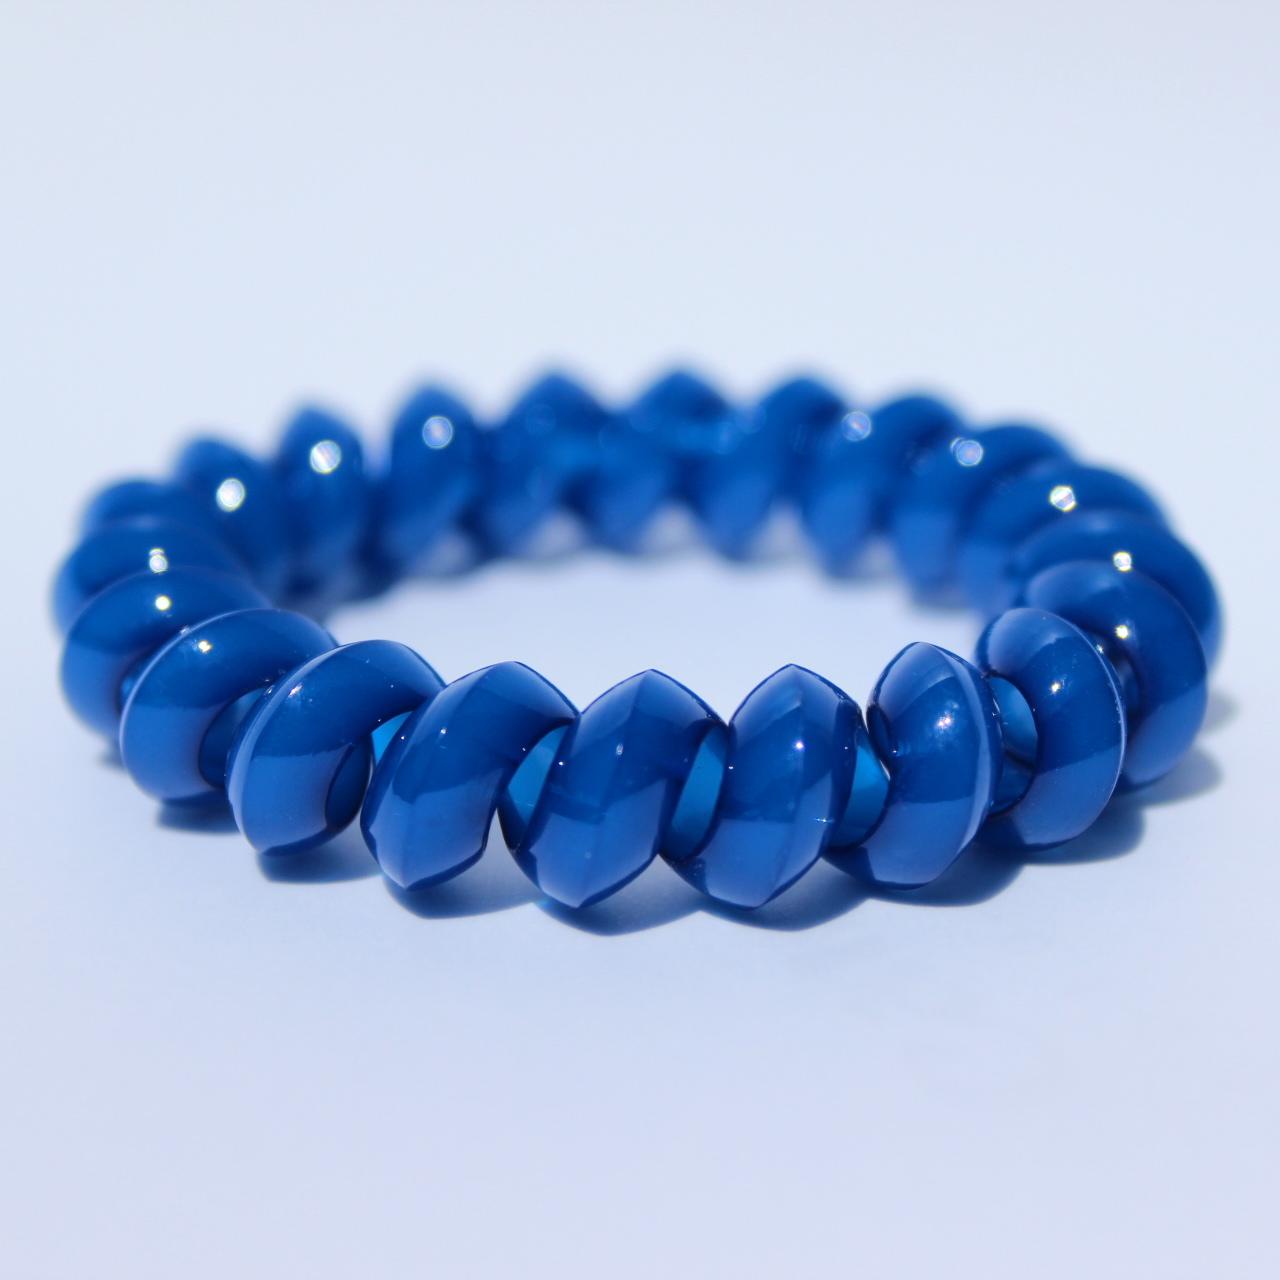 Tmavomodrá gumička do vlasov Hairfix - Solid Dark Blue